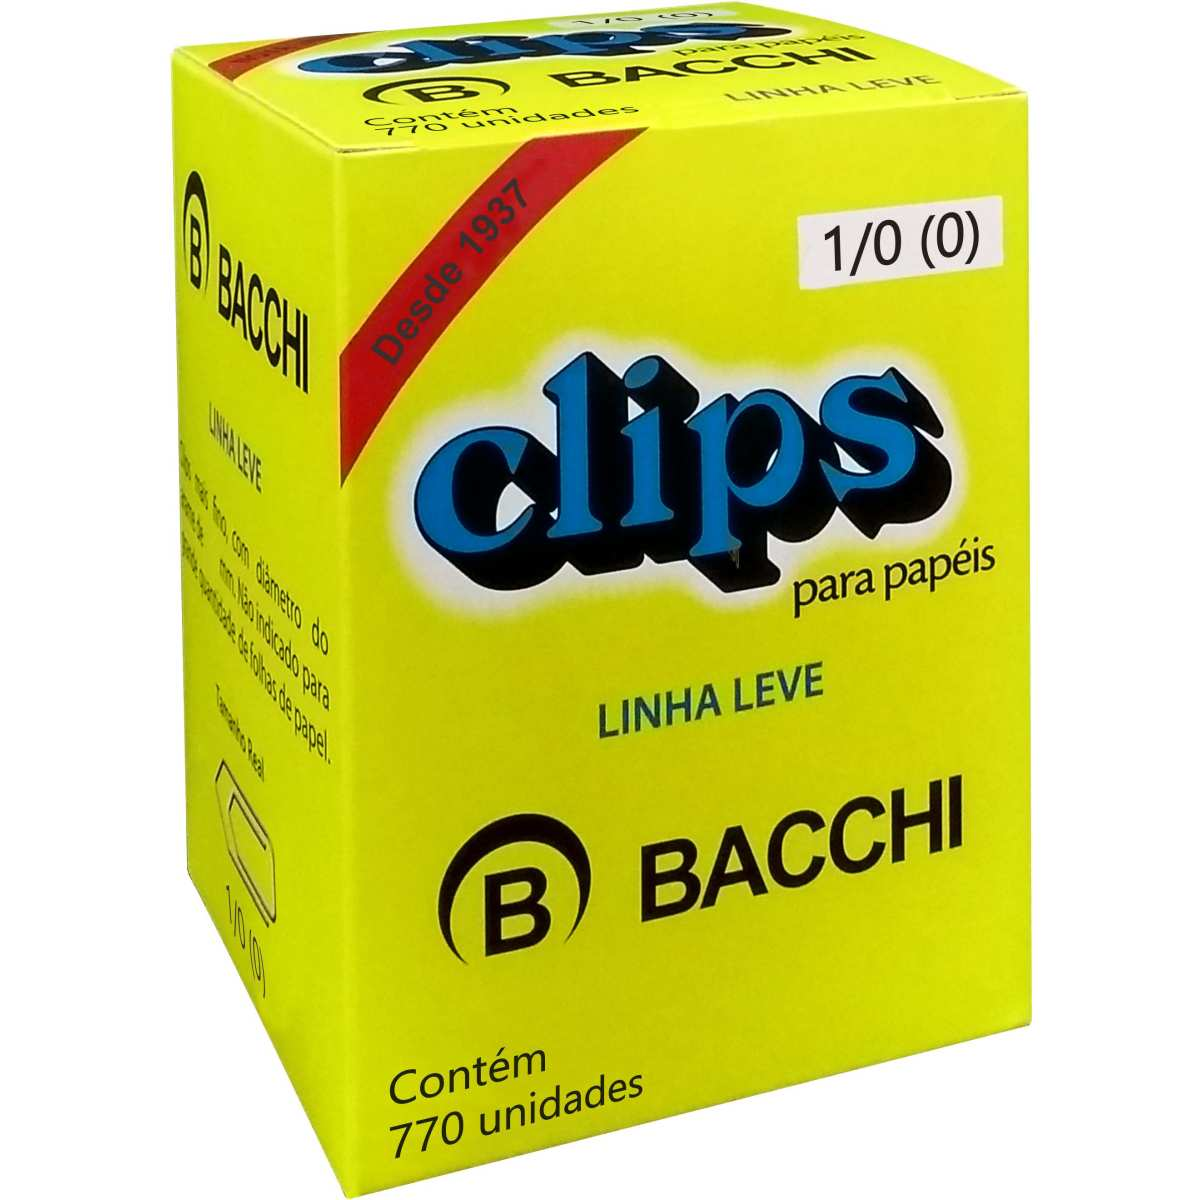 CLIPS METÁLICOS BACCHI Nº 1/0 (0) 770 UN